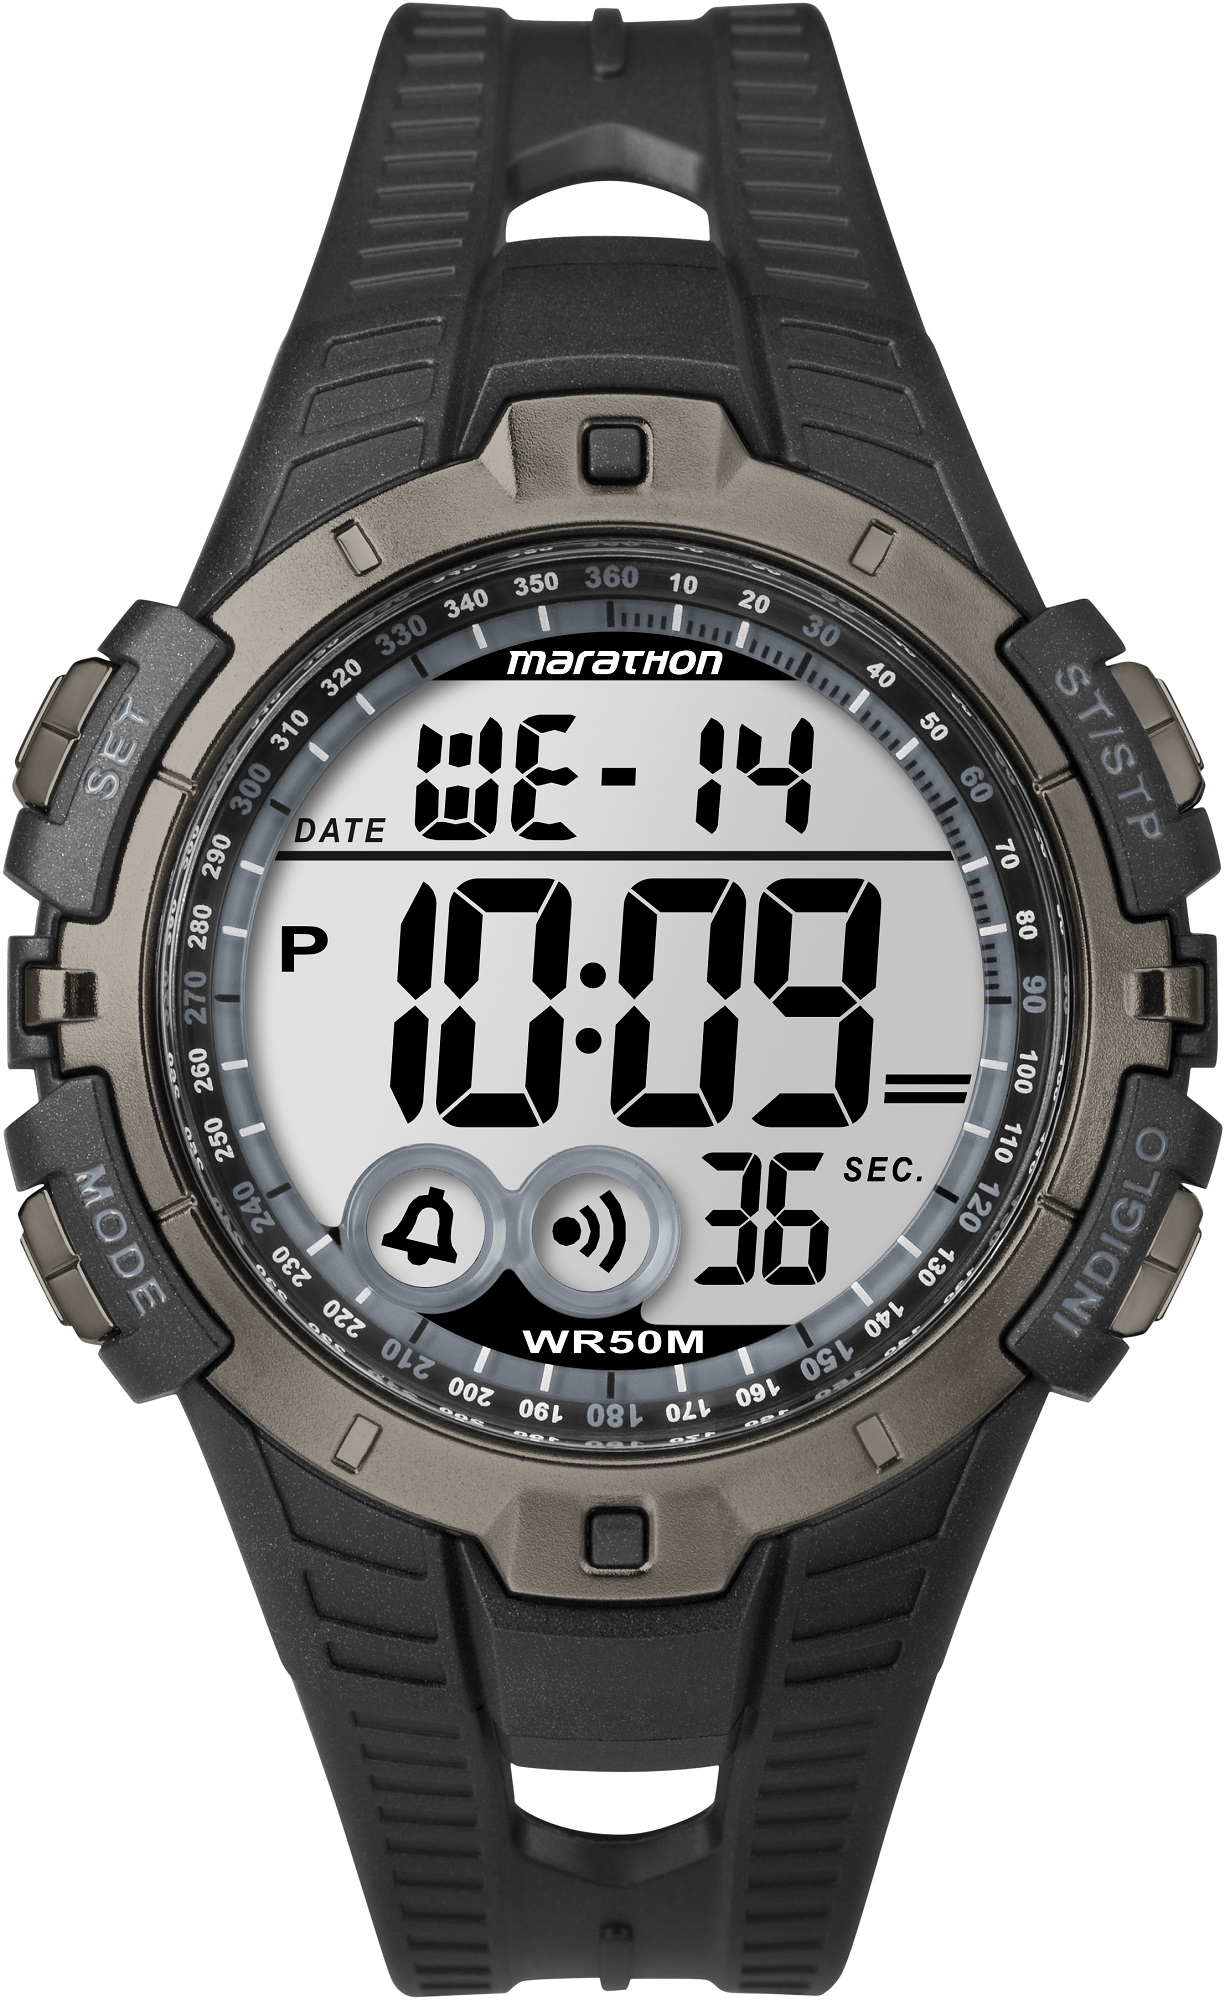 Наручные часы мужские Timex Marathon, цвет: черный. T5K802 все цены